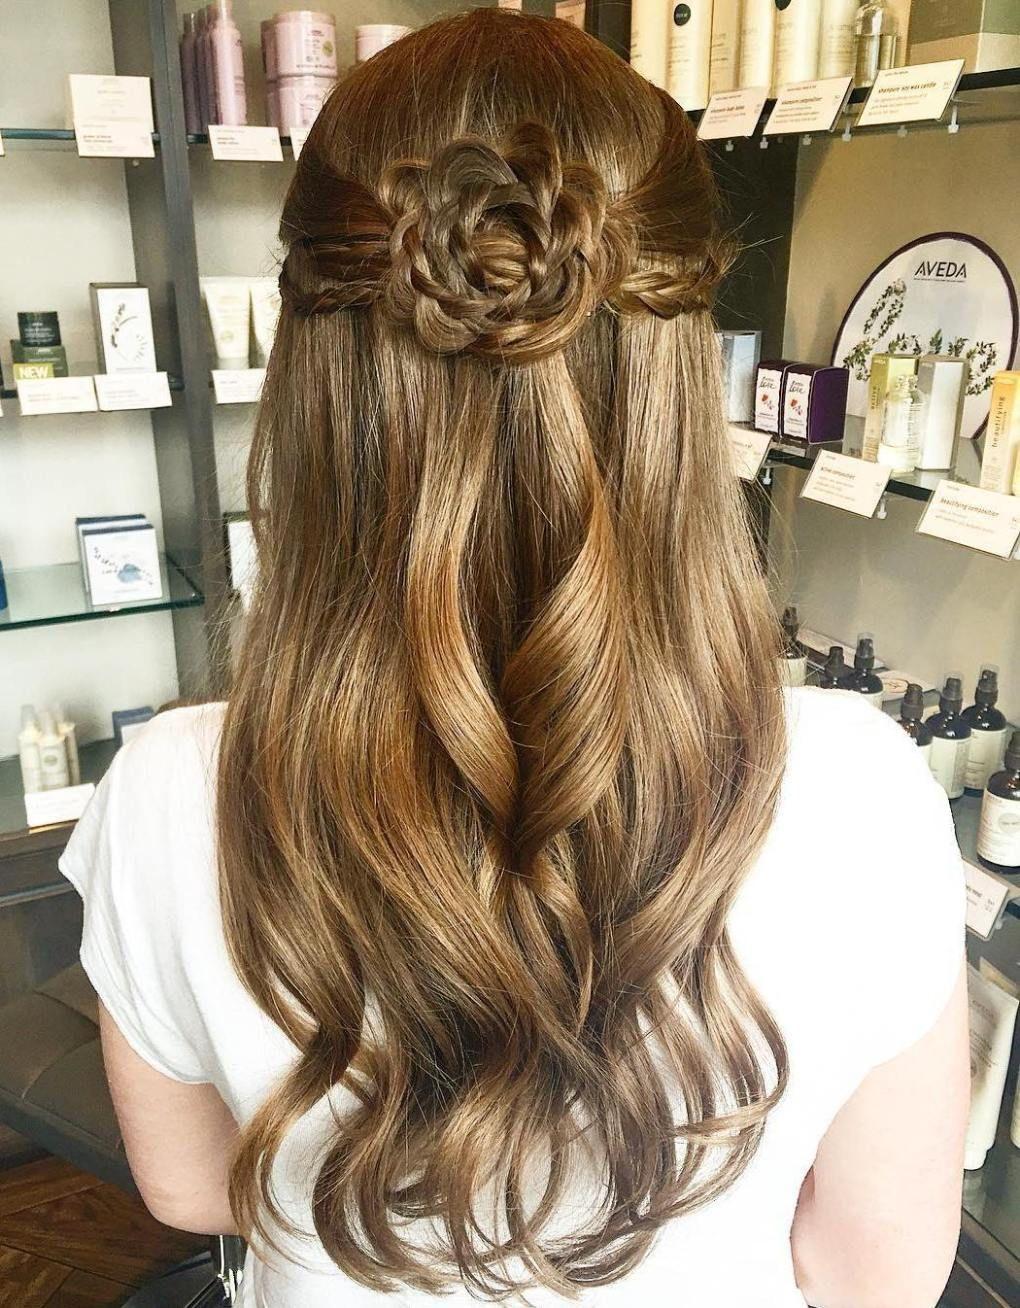 40 Diverse Homecoming Hairstyles For Short Medium And Long Hair Frisuren Lange Haare Jugendweihe Frisuren Offene Haare Glatt Hochsteckfrisuren Mittellang